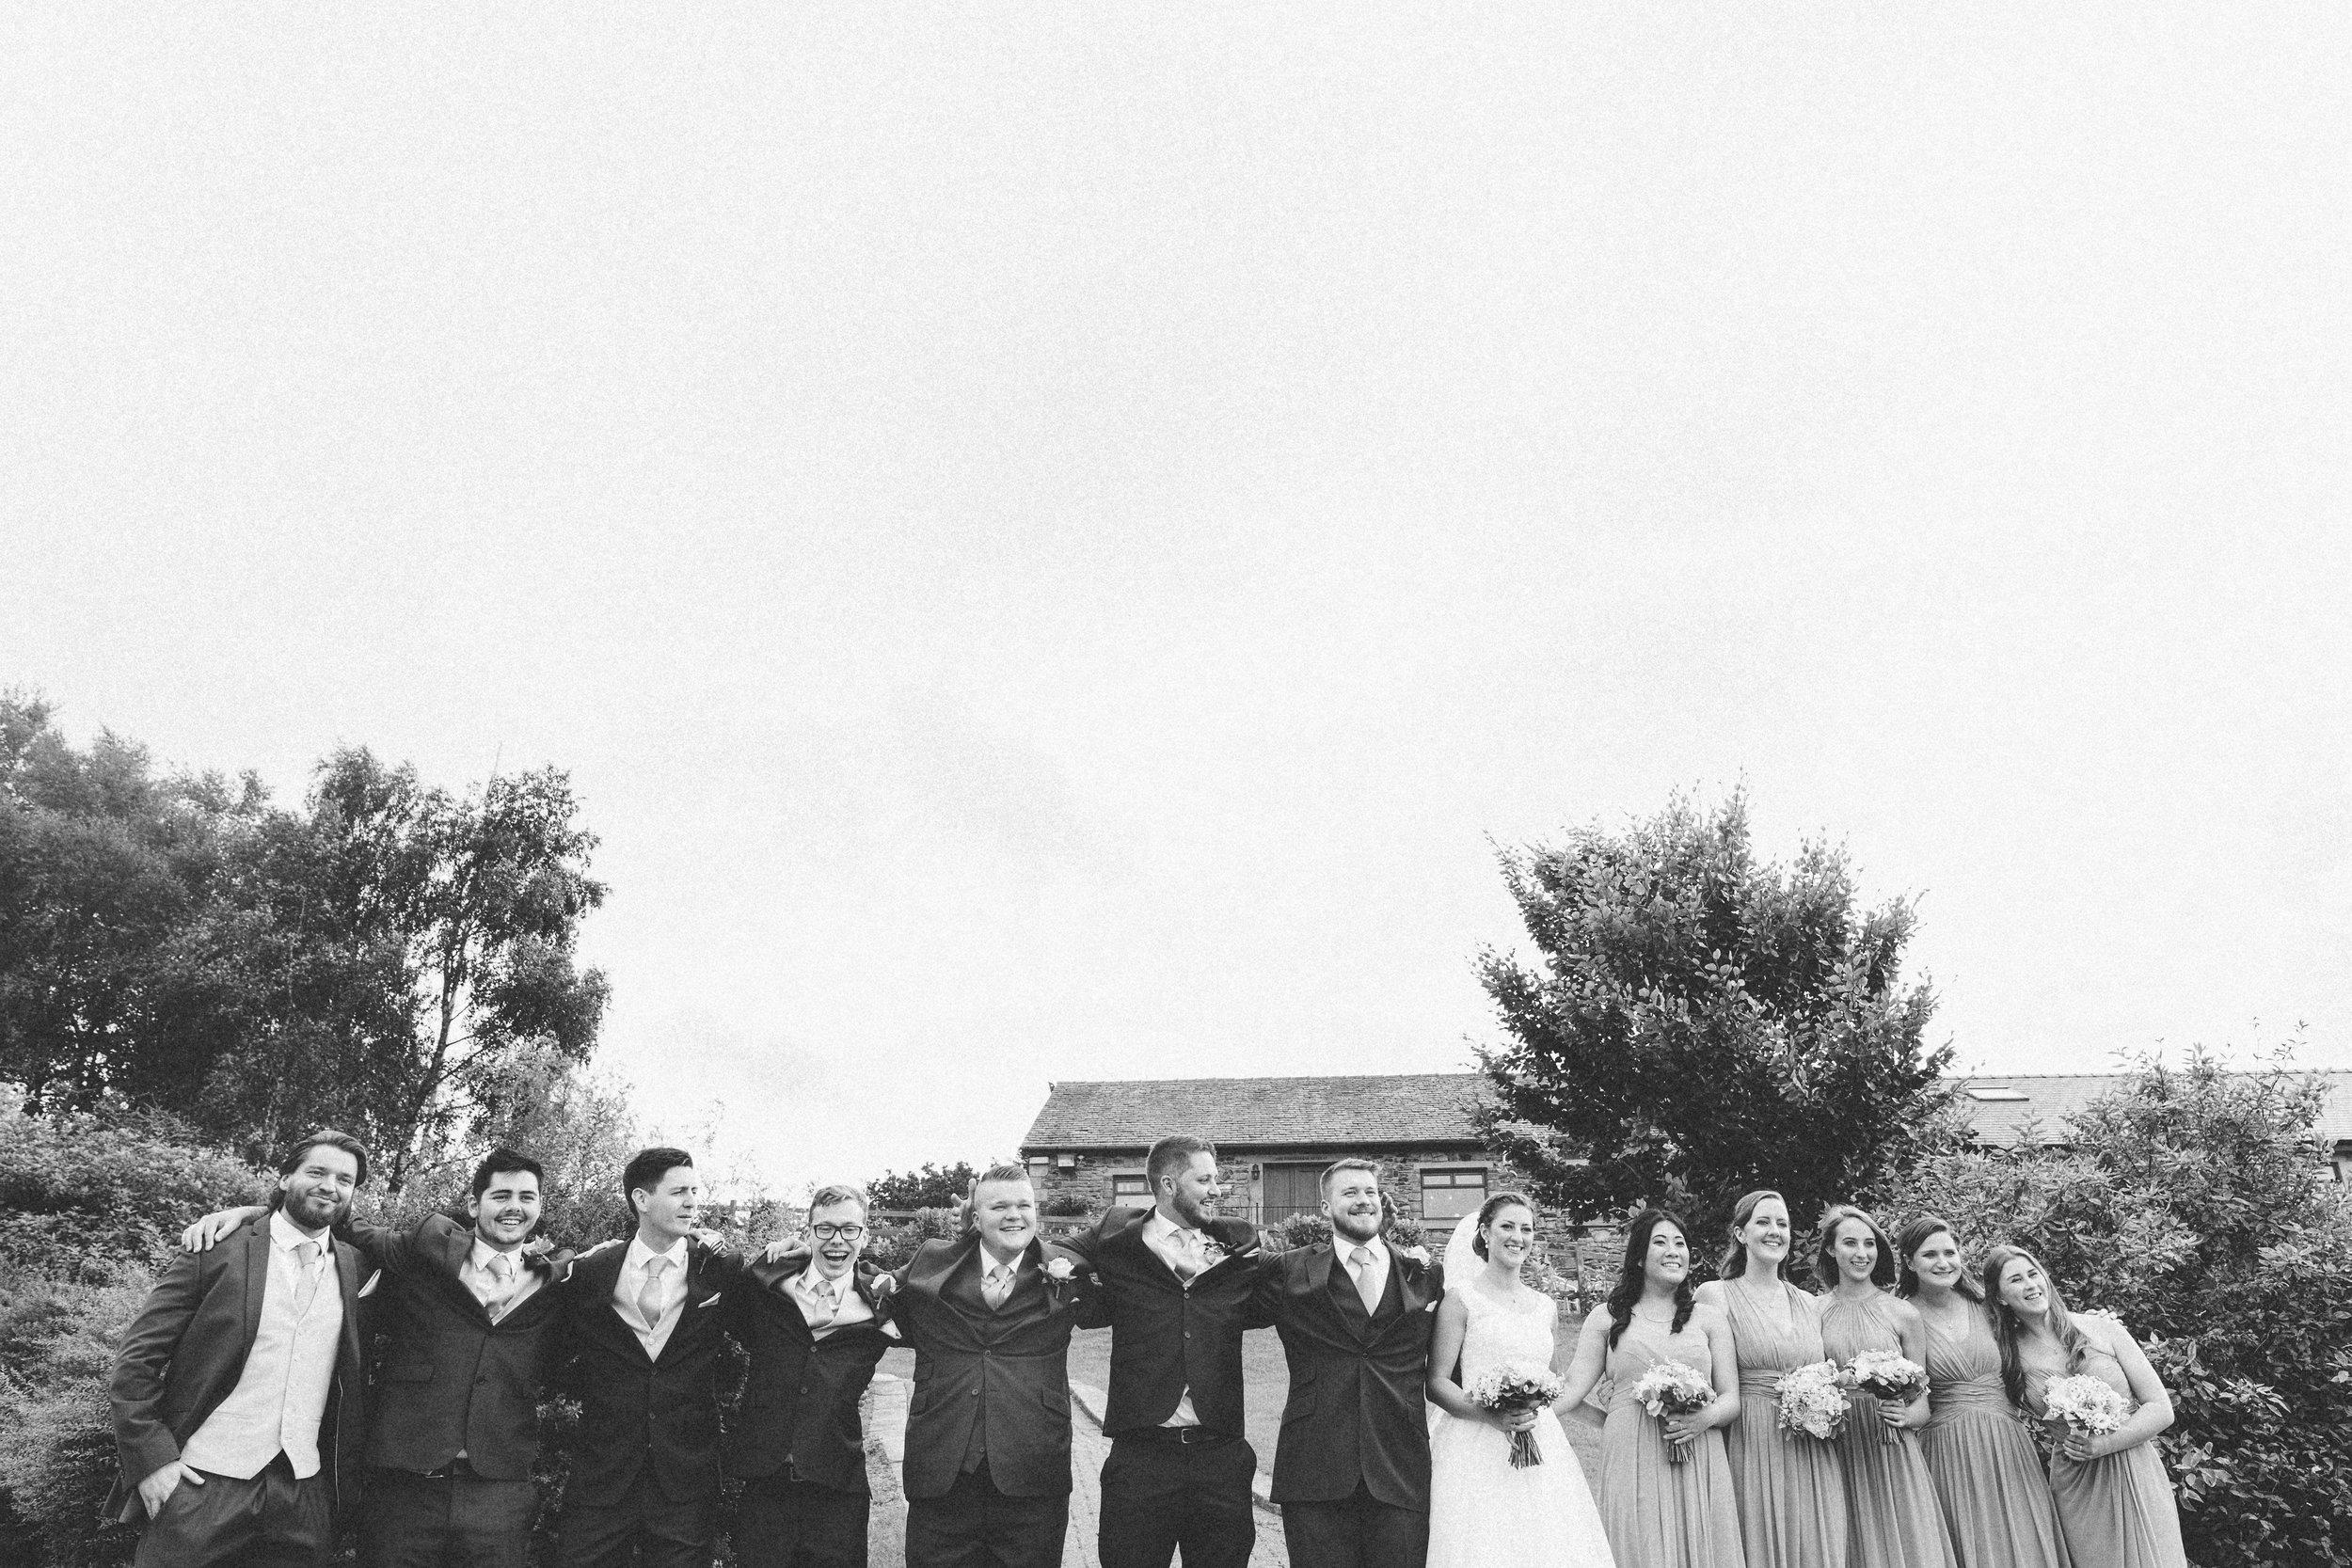 Kathryn-and-Mike-Wedding-Highlights-52.jpg